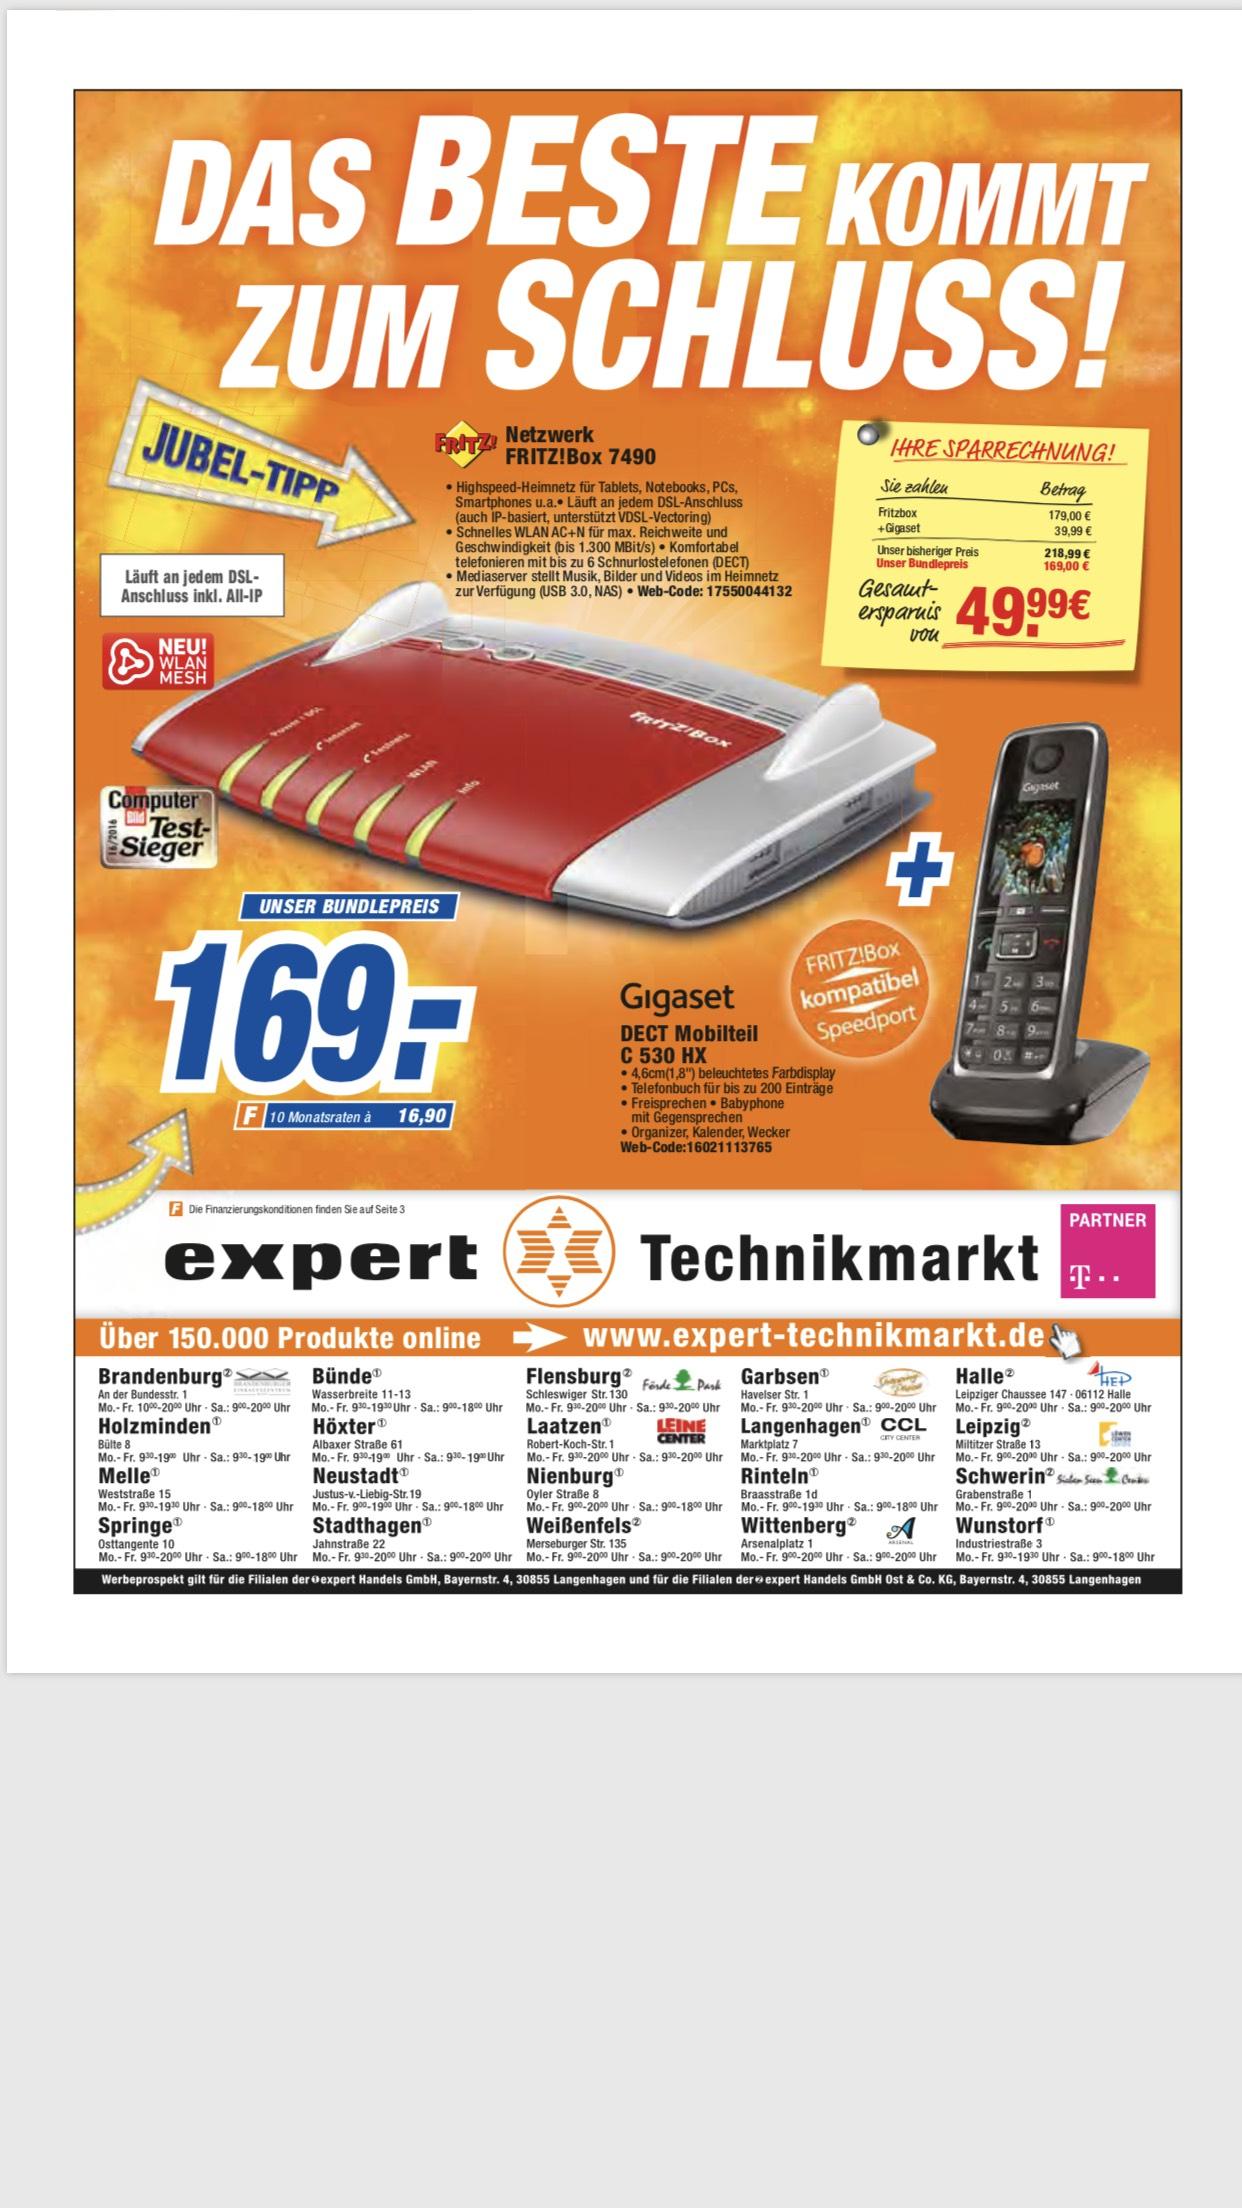 AVM FRITZ!Box 7490 + Gigaset C530HX für 169€ [Expert](Lokal?)